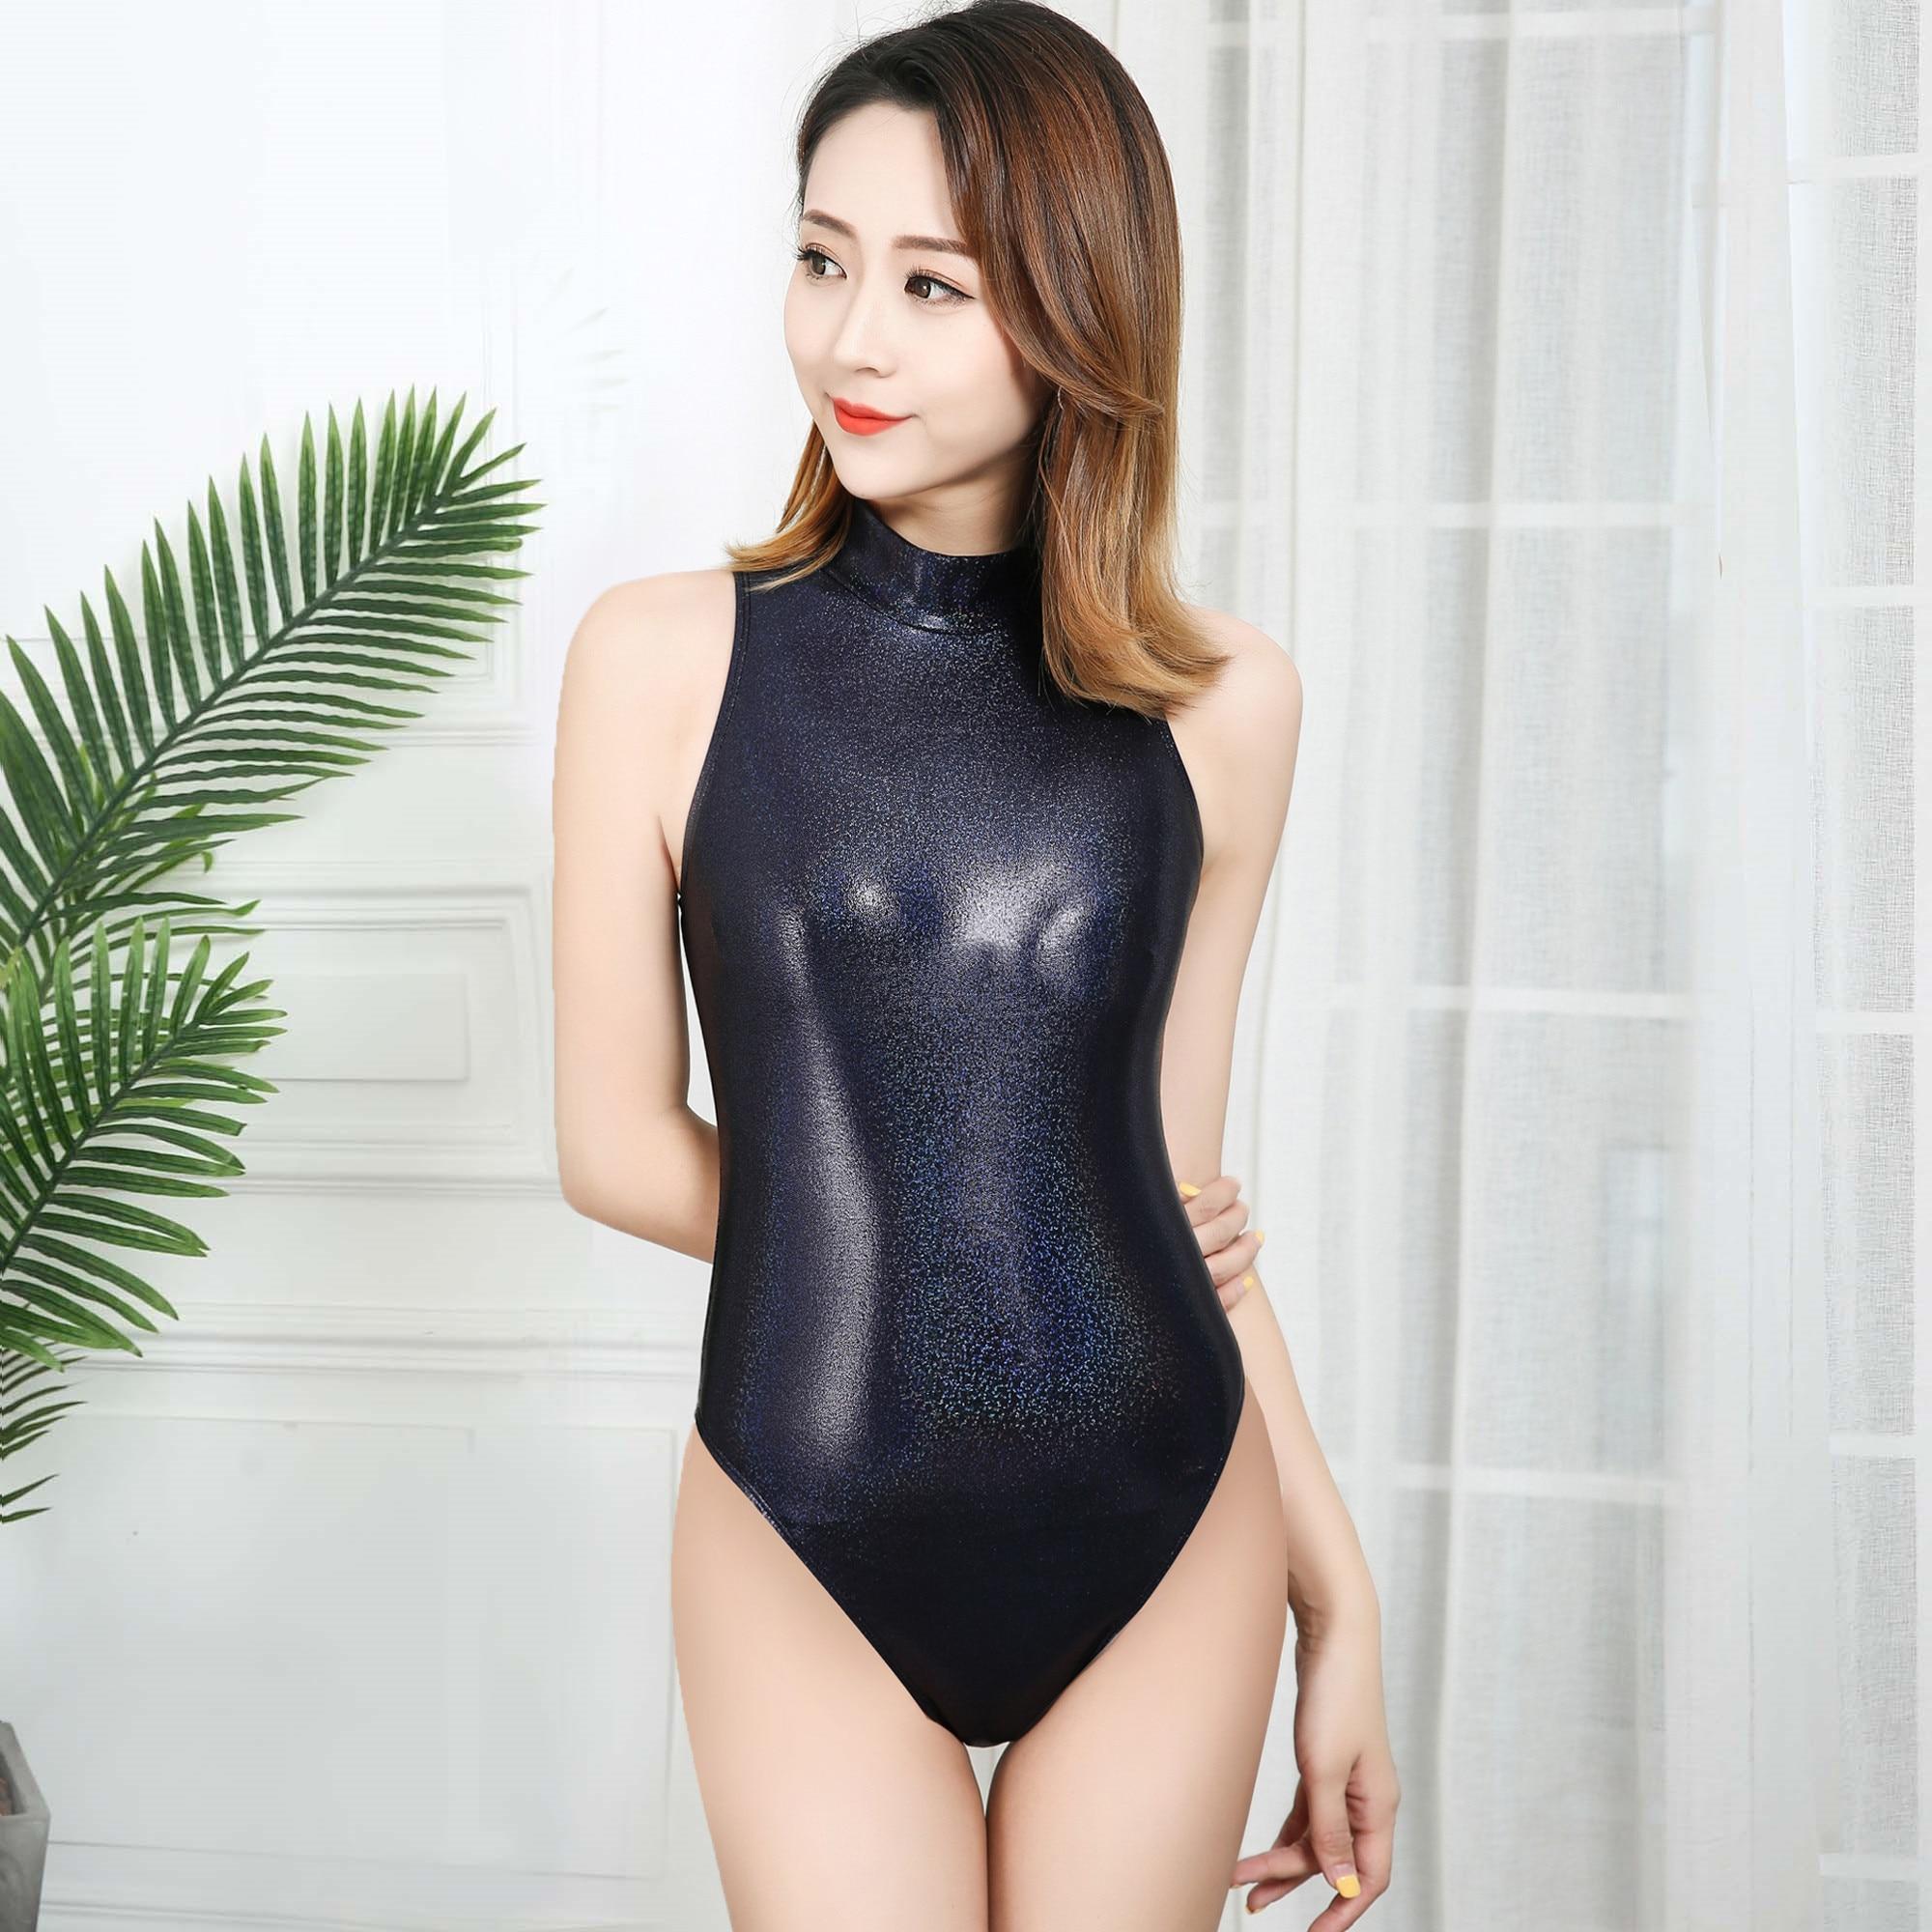 Drozeno sexy collants trajes de banho 2020 womens dead wate japonês maiô preto brilhante maiô uma peça swimsuitwomen